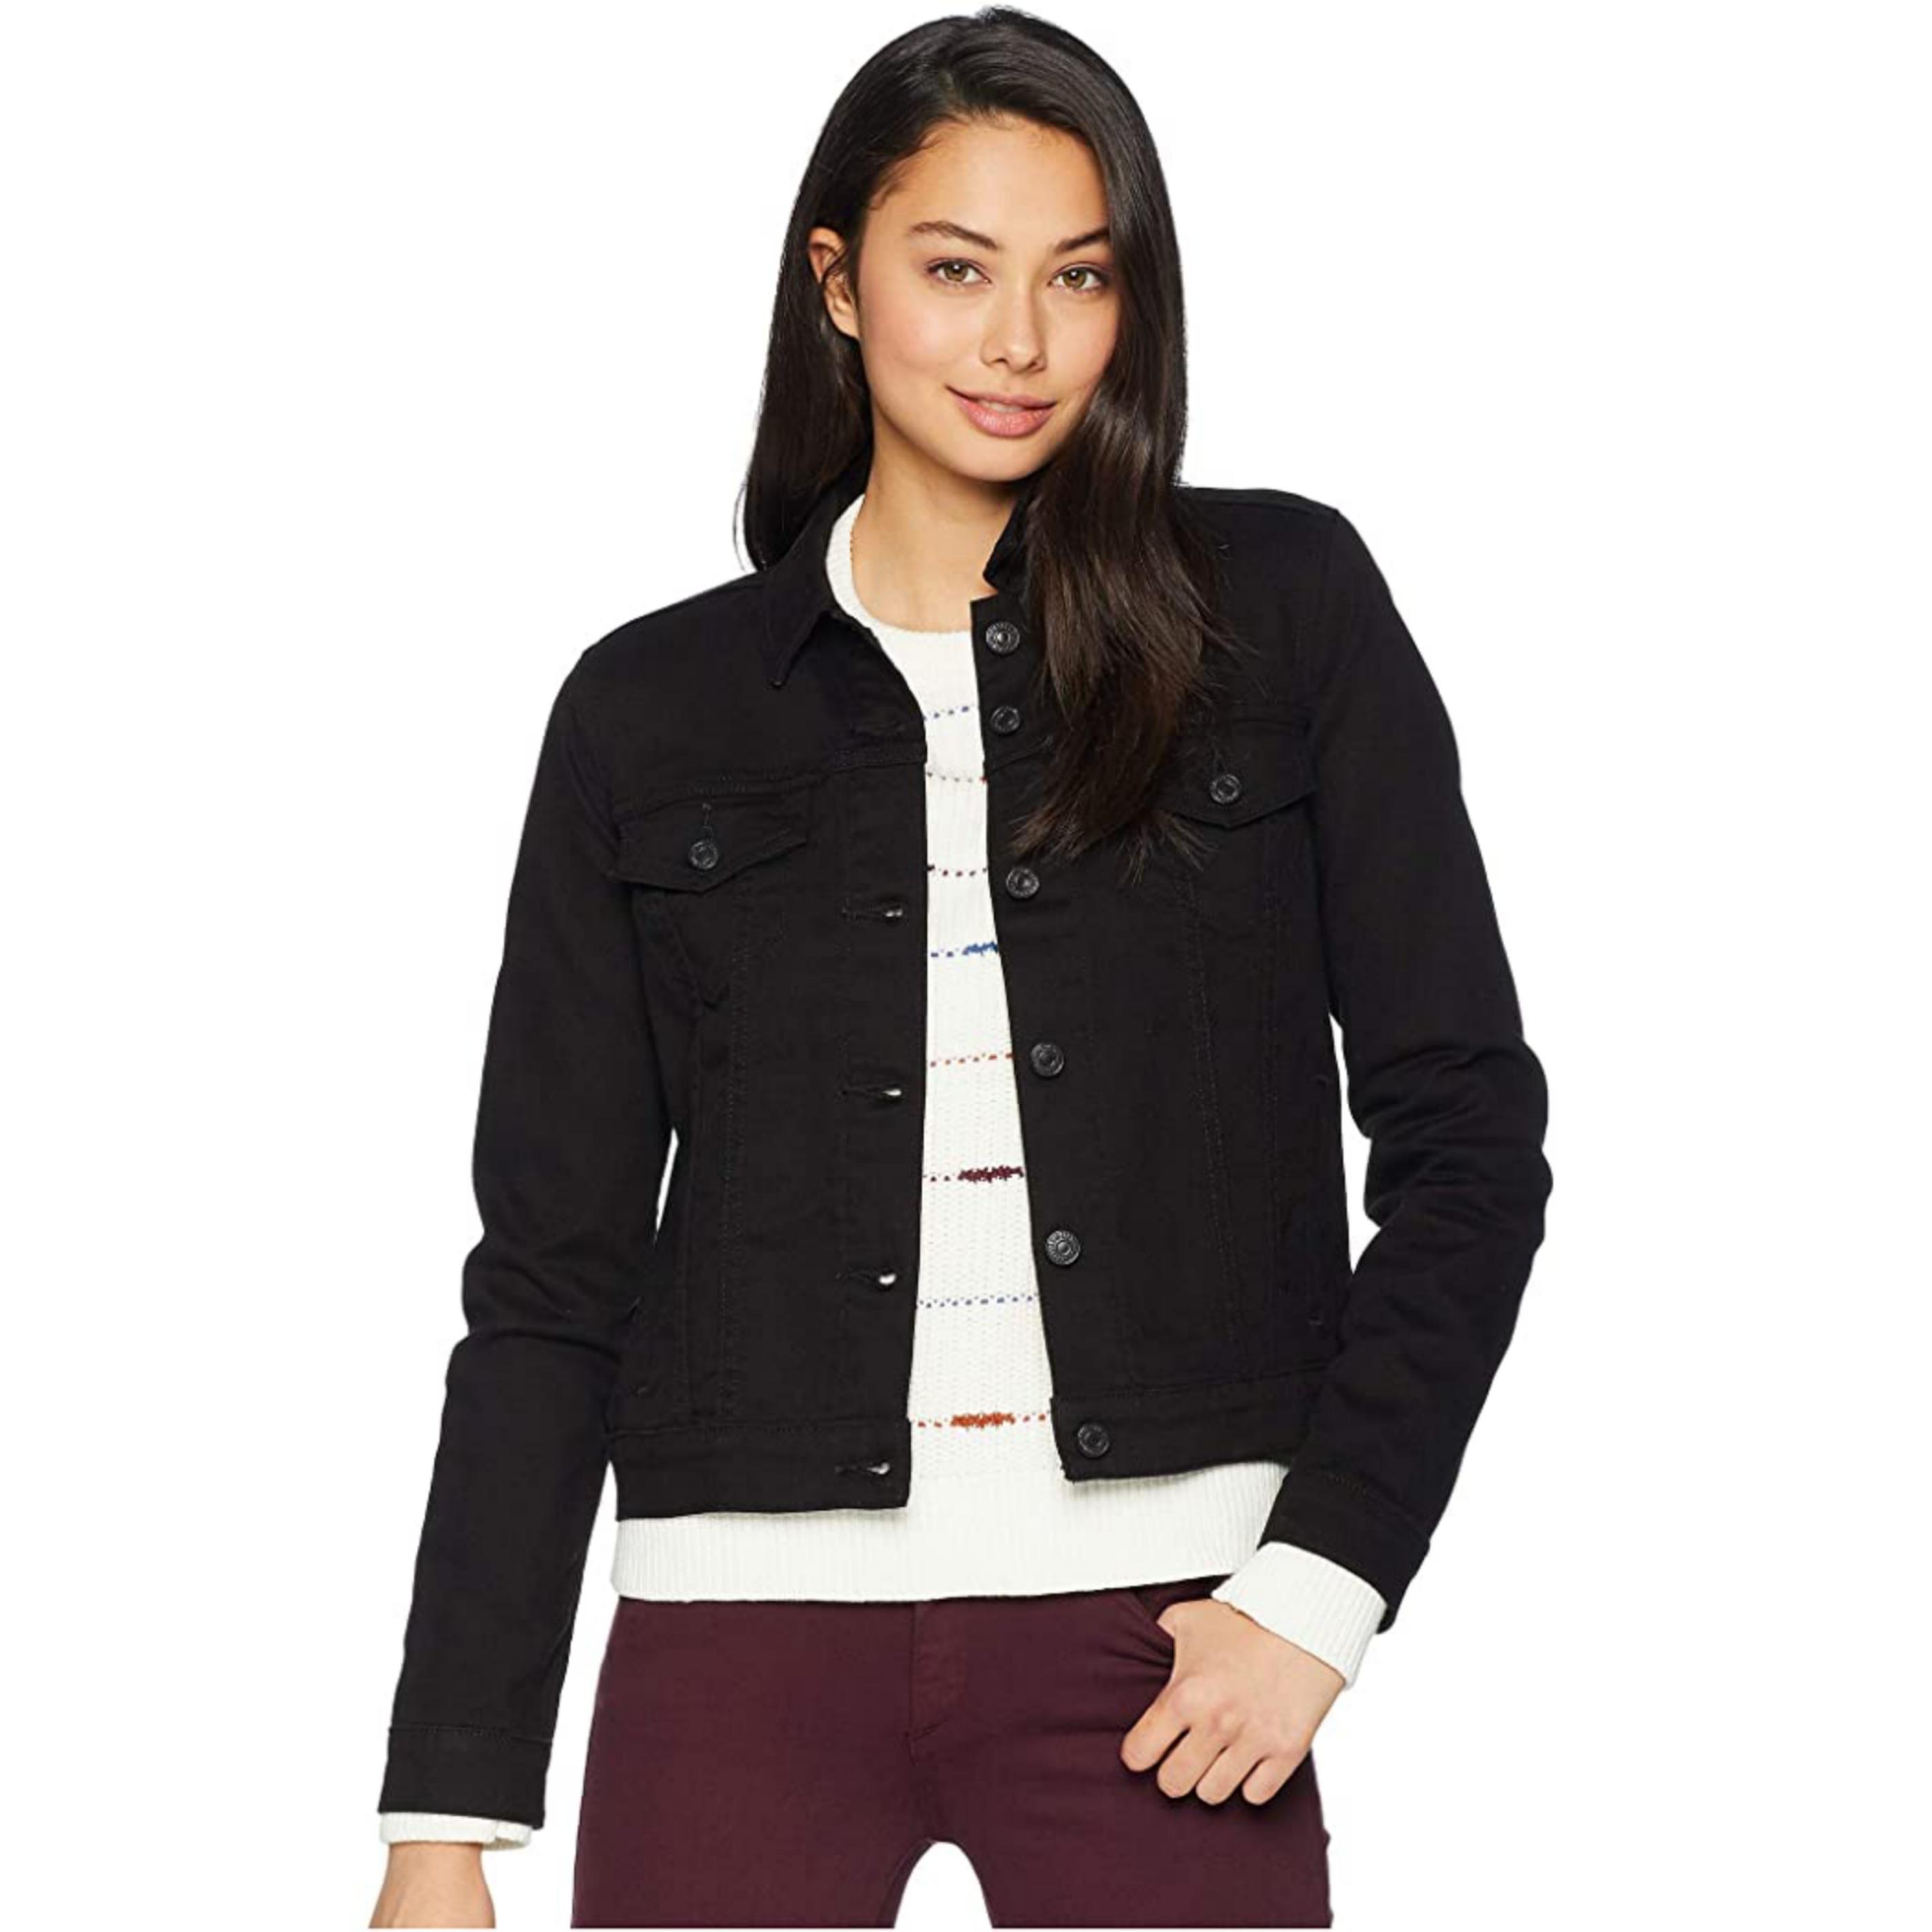 Denim Jacket For Women - New Style Jet Black Jacket for Woman